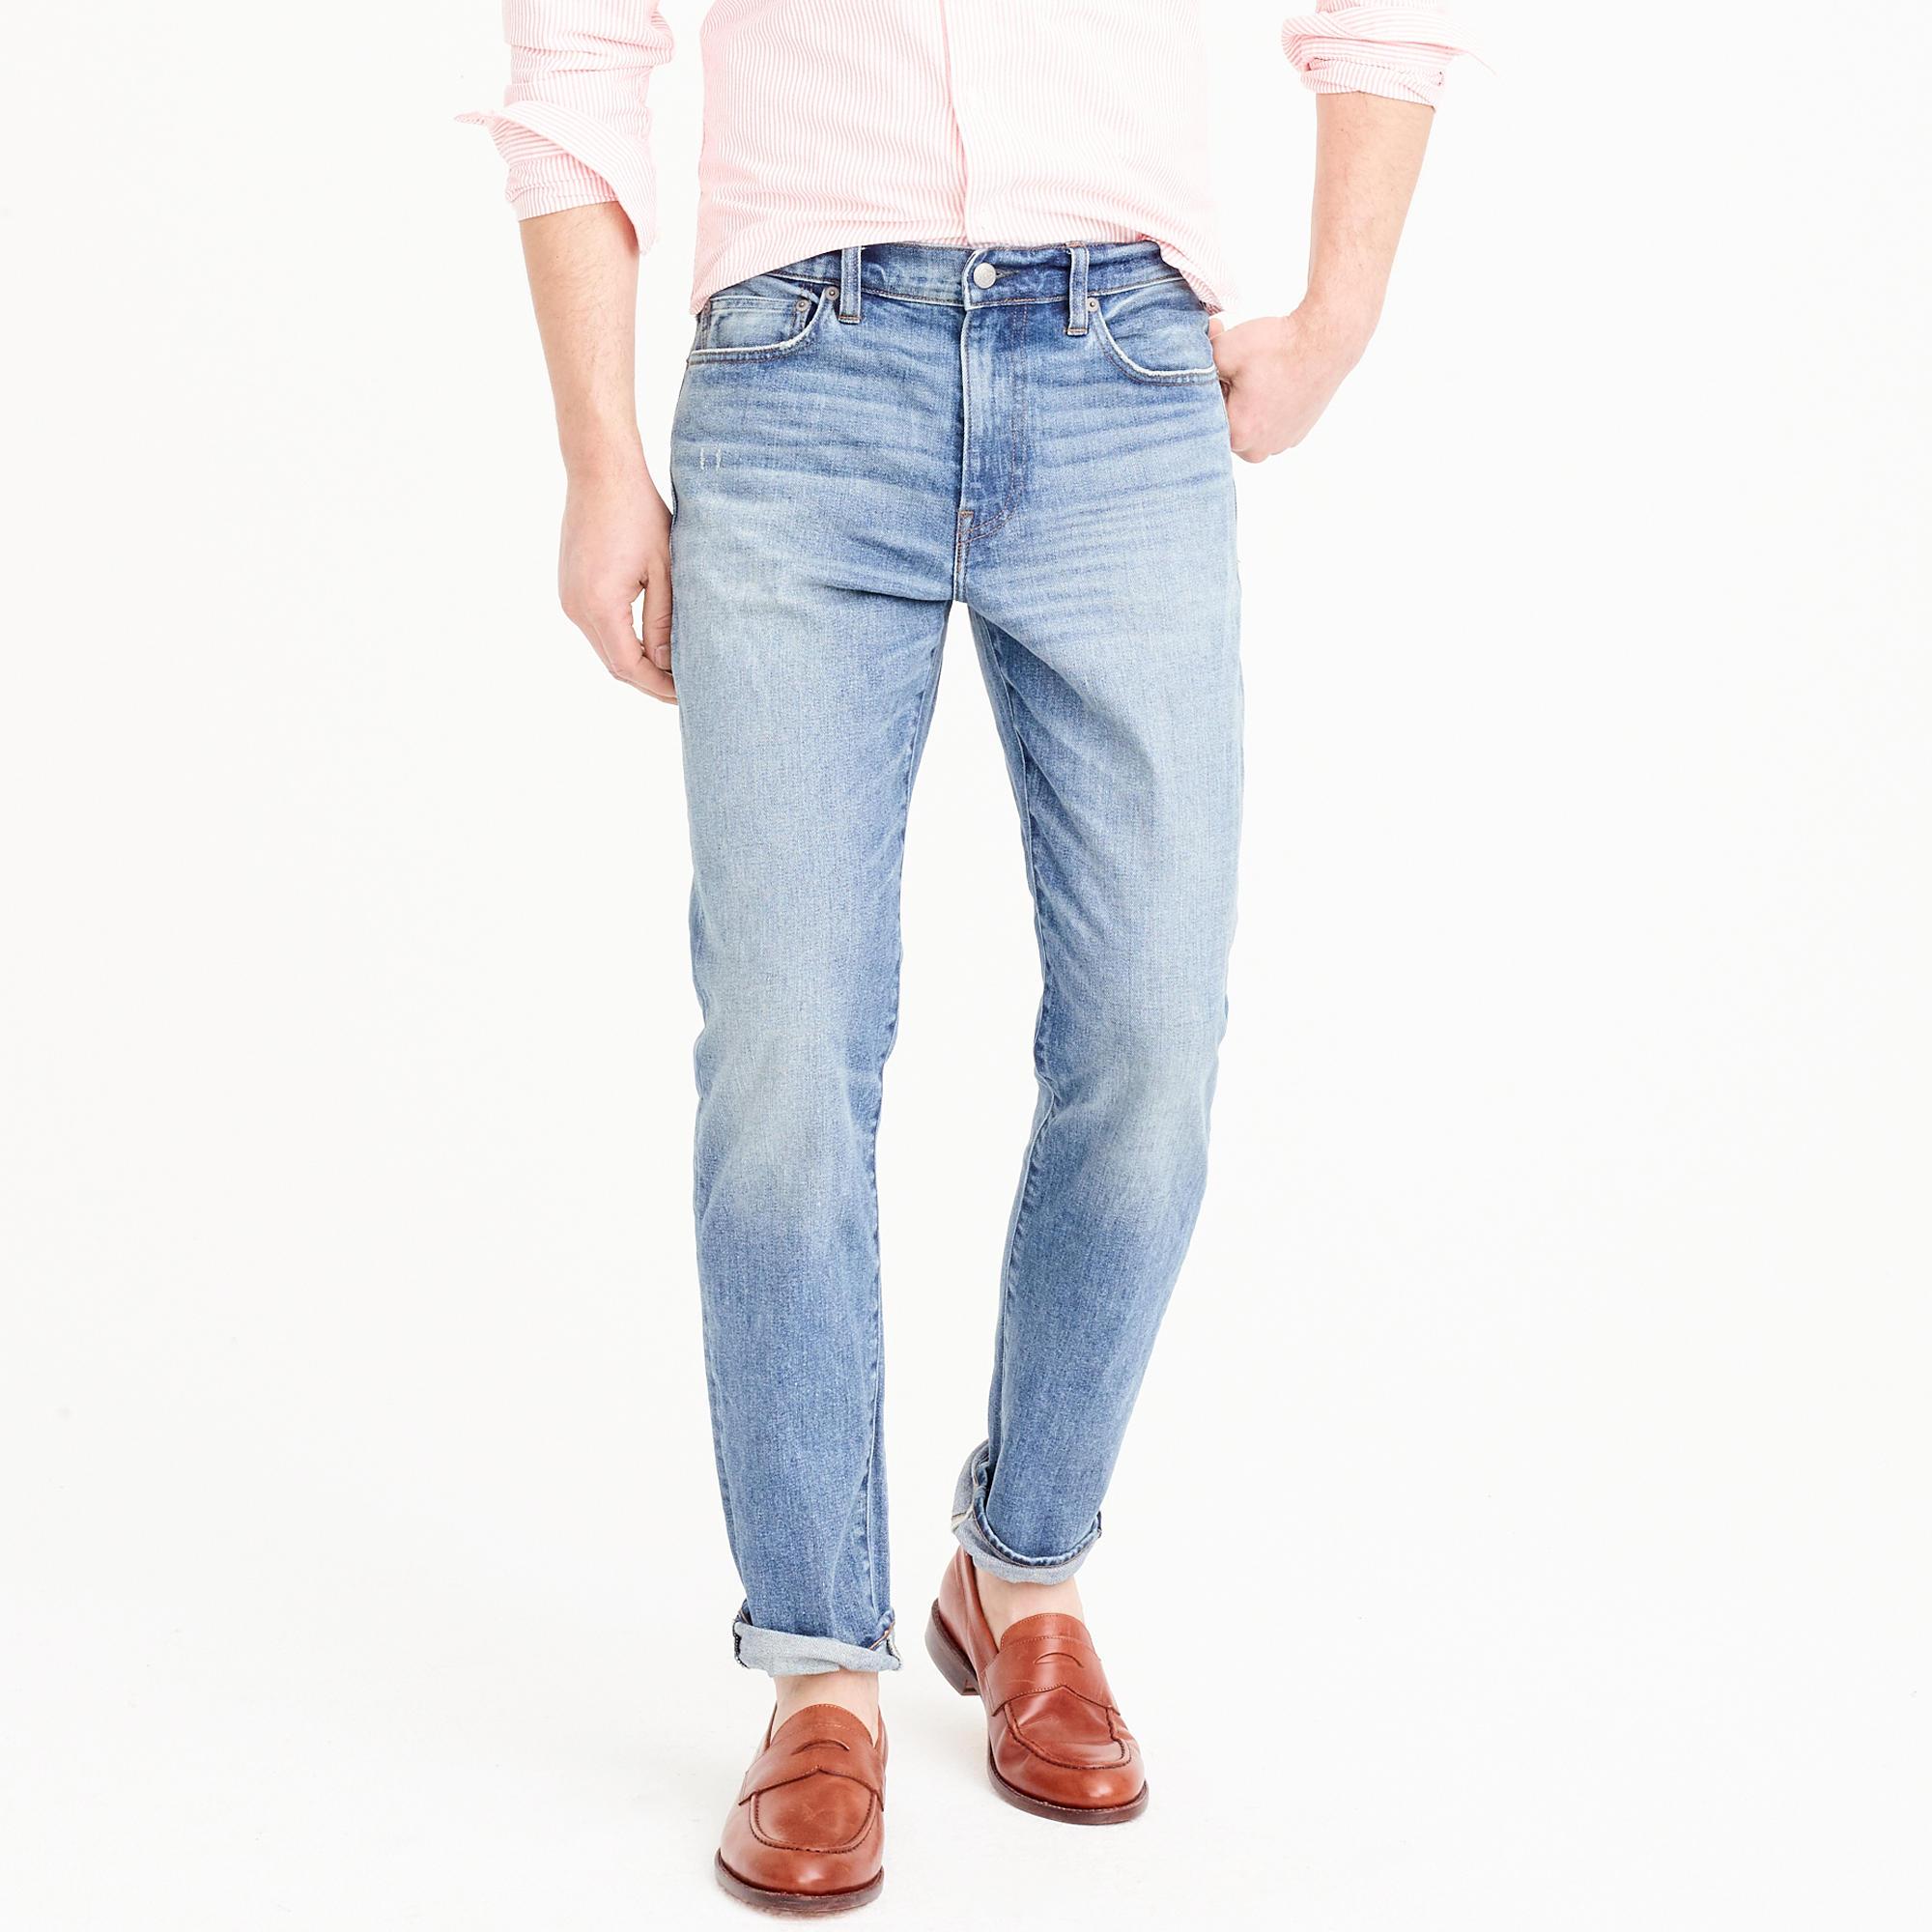 Men's Jeans & Denim | J.Crew